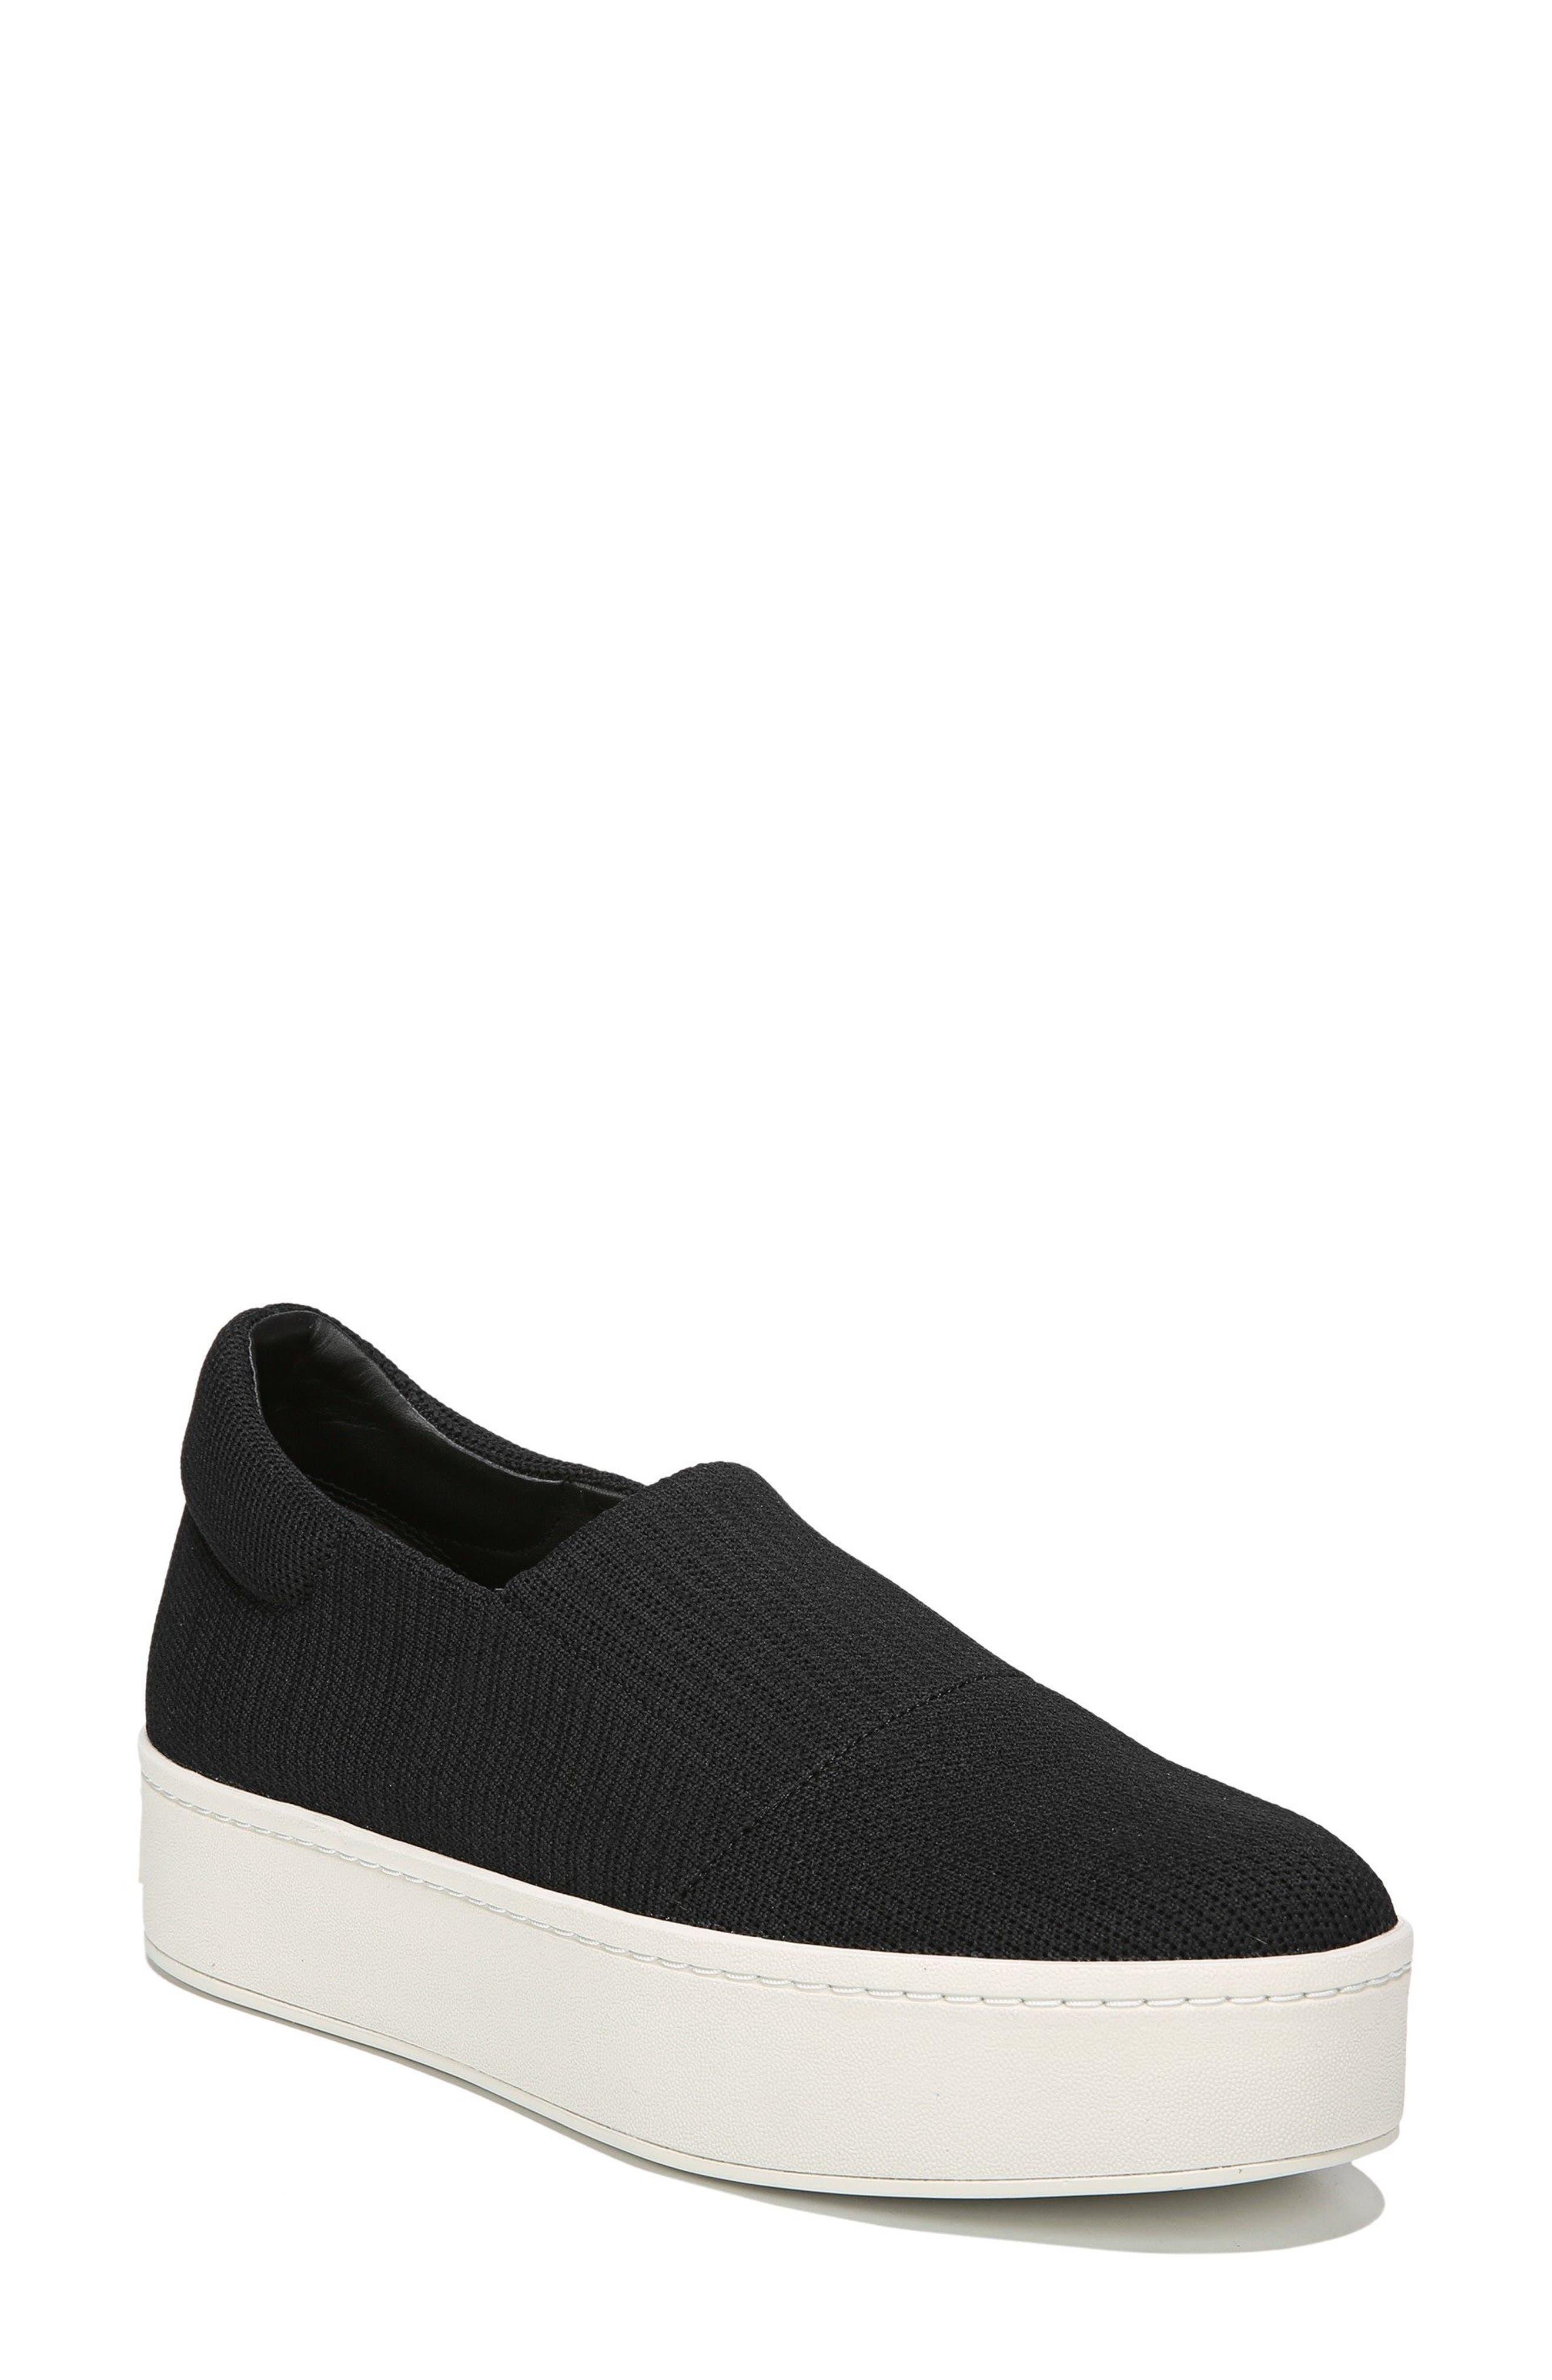 Walsh Slip-On Sneaker,                         Main,                         color, Black